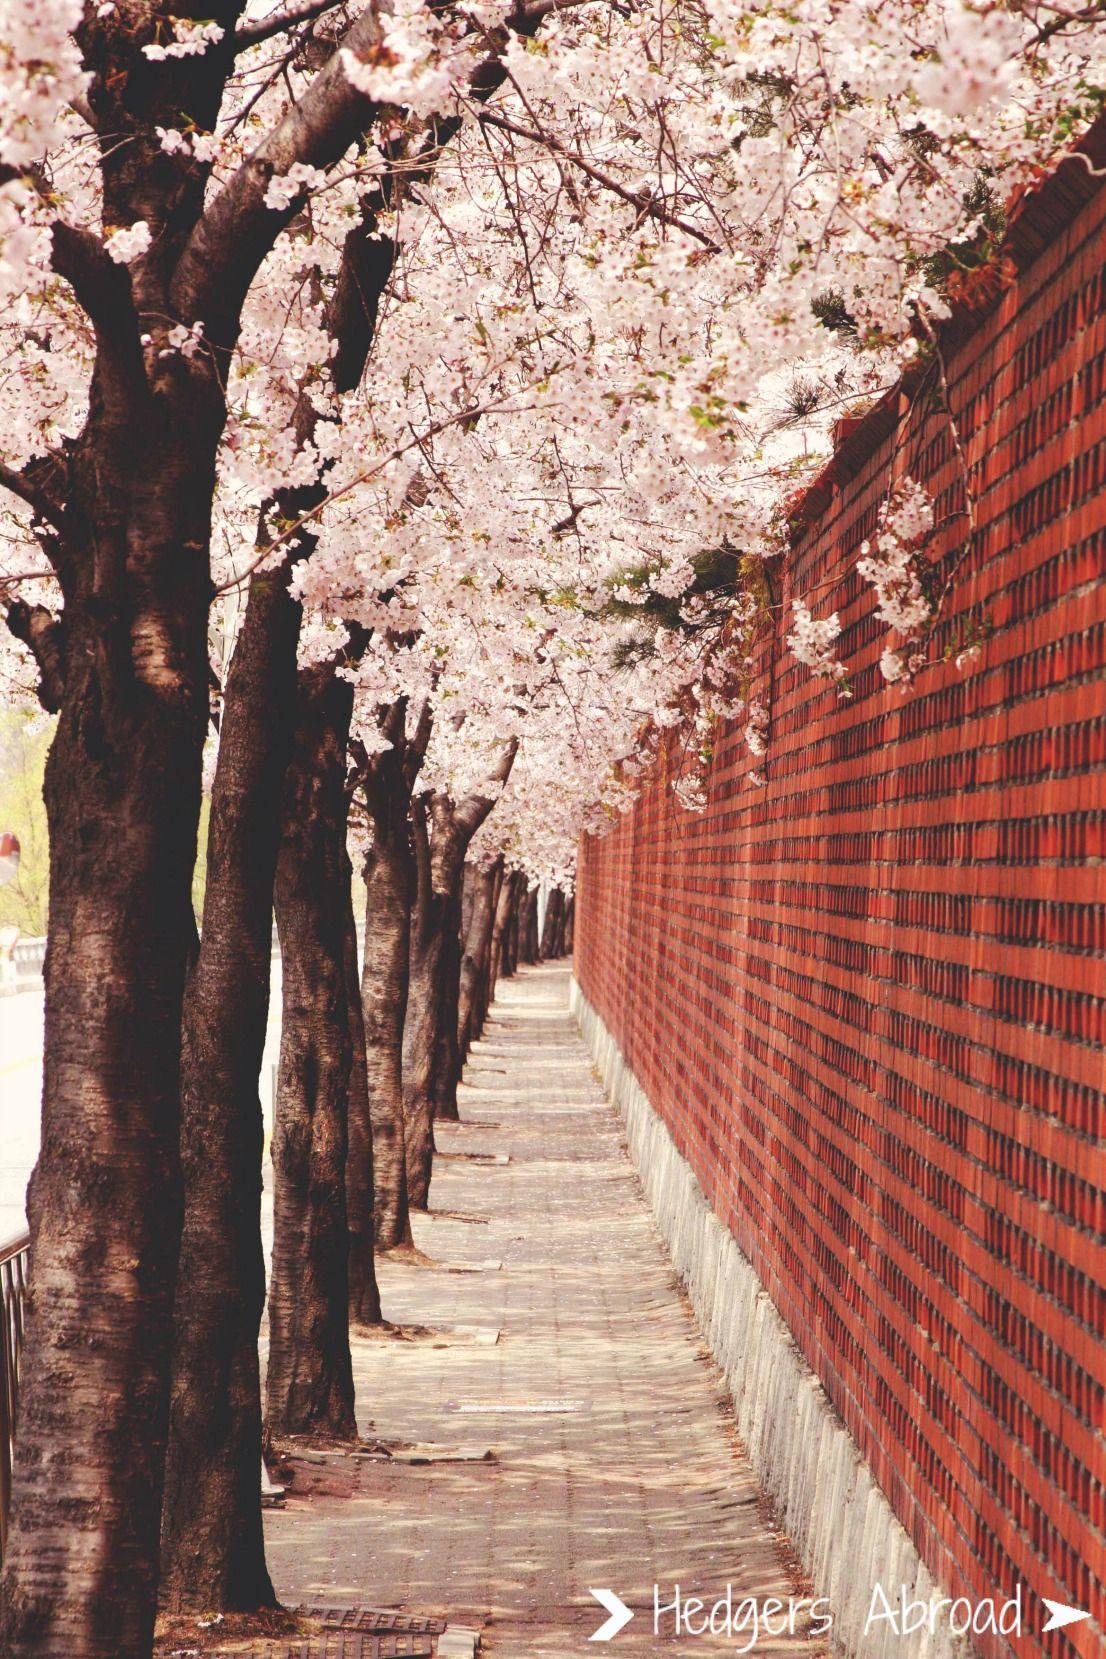 Spring Is My Favorite Season In Korea Cherry Blossoms In Seoul South Korea South Korea Travel Korea Wallpaper South Korea Seoul